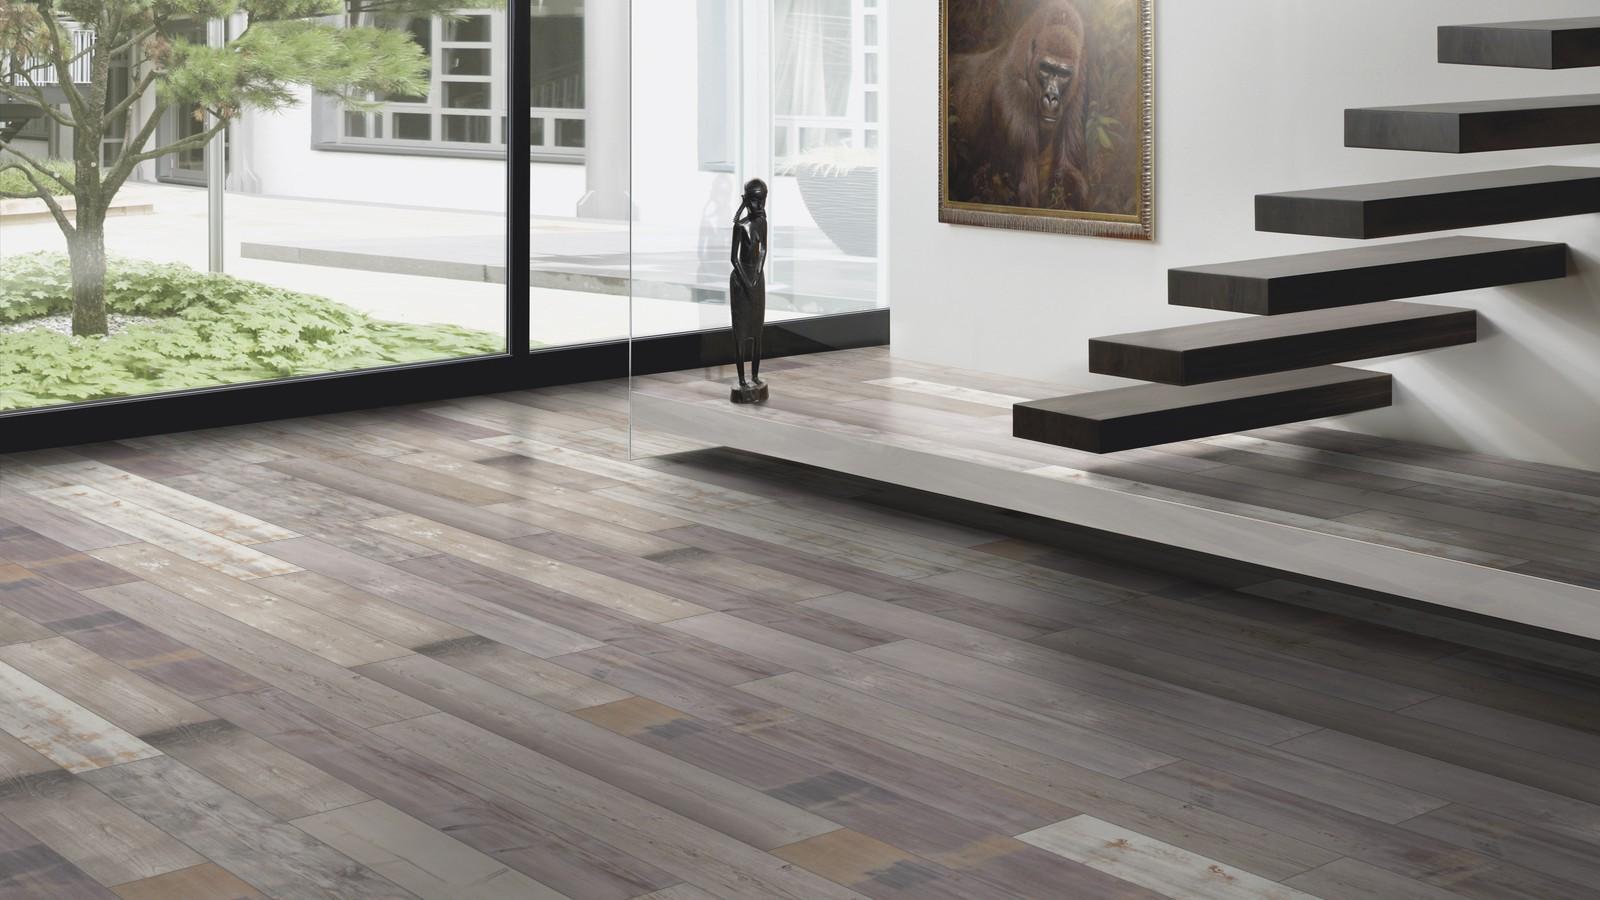 avatara driftwood grey beige man made wood floor wood4floors. Black Bedroom Furniture Sets. Home Design Ideas